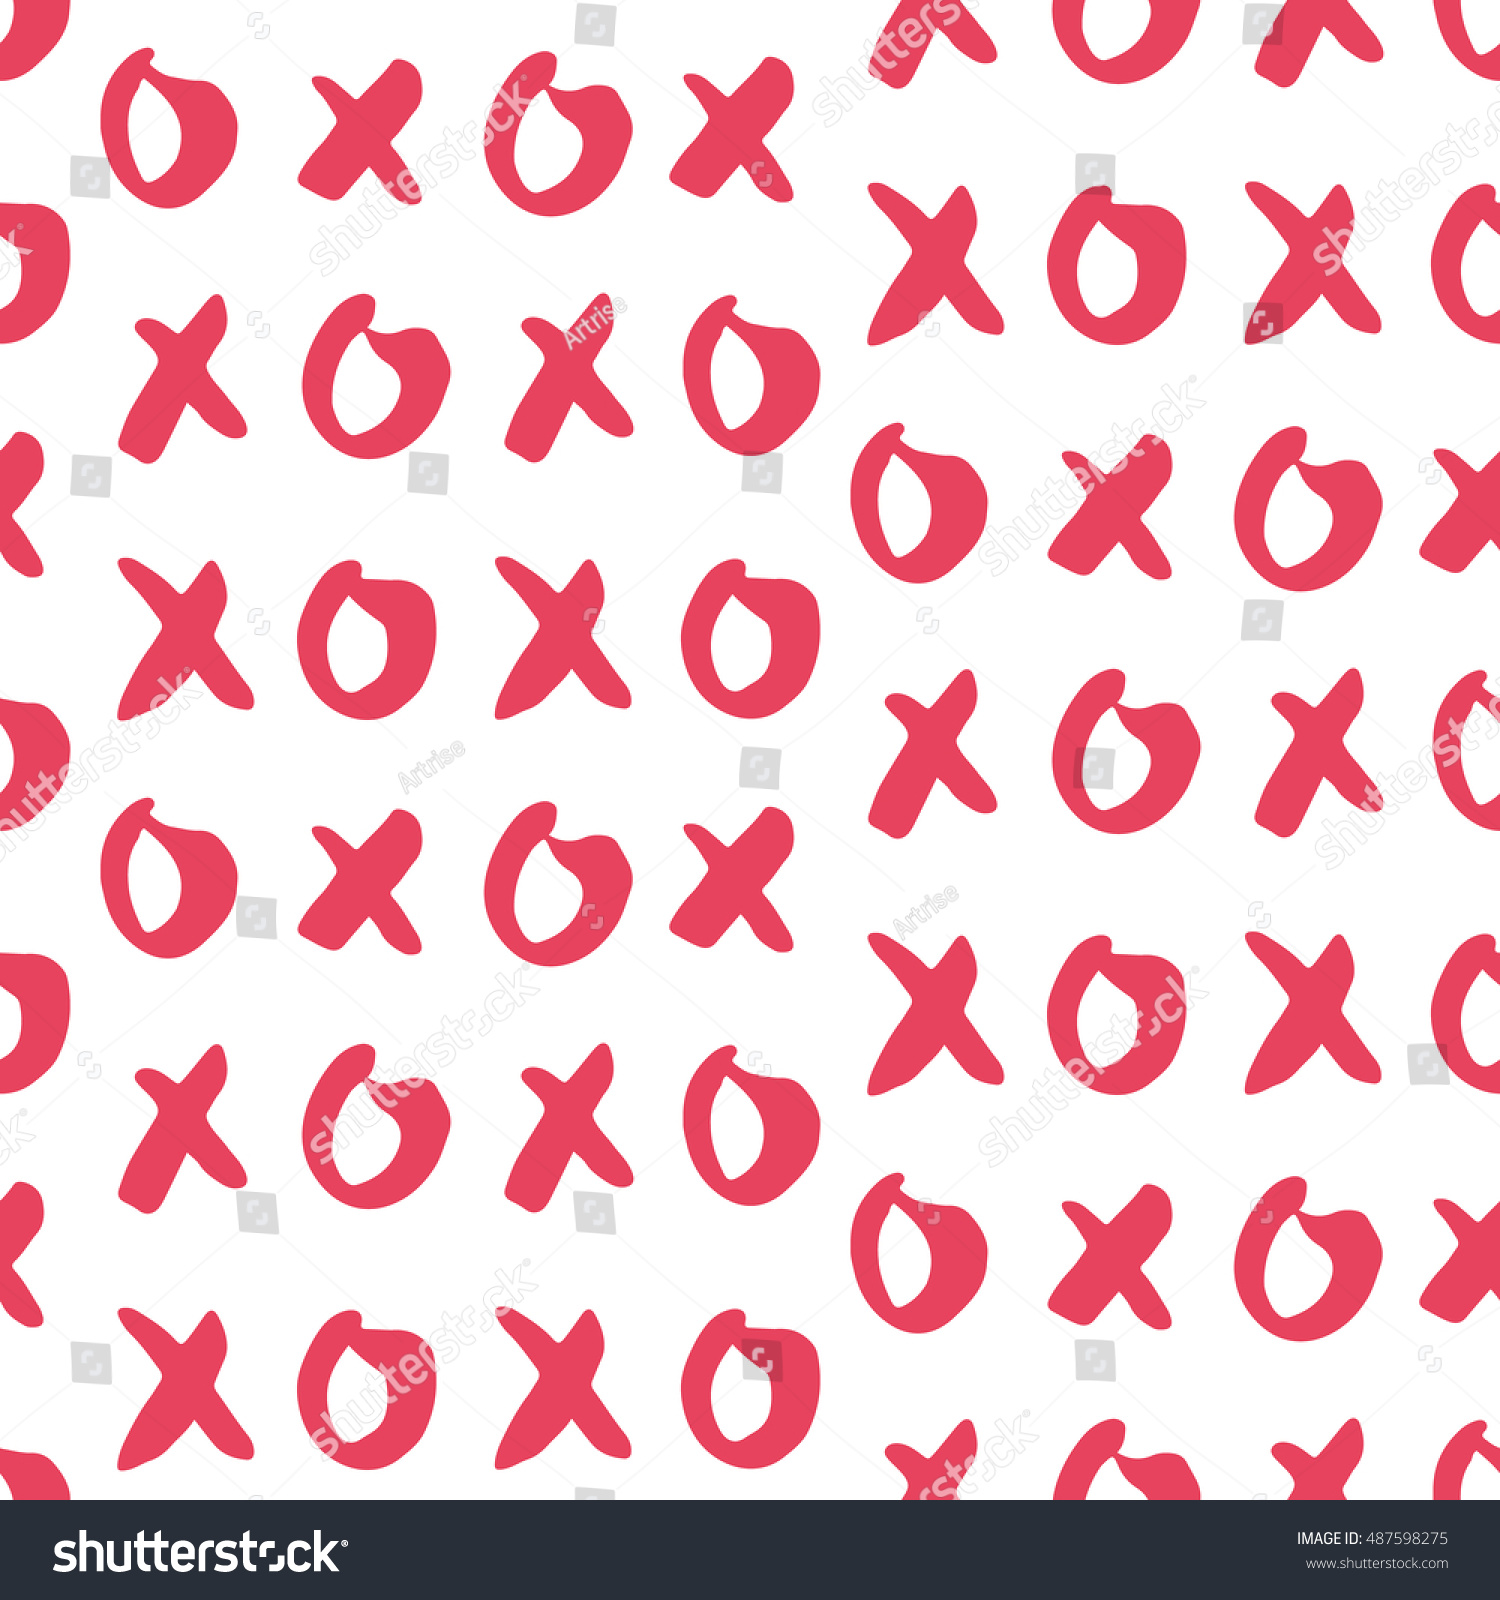 Hand Drawn Vector Seamless Pattern Xoxo Stock Vector Royalty Free